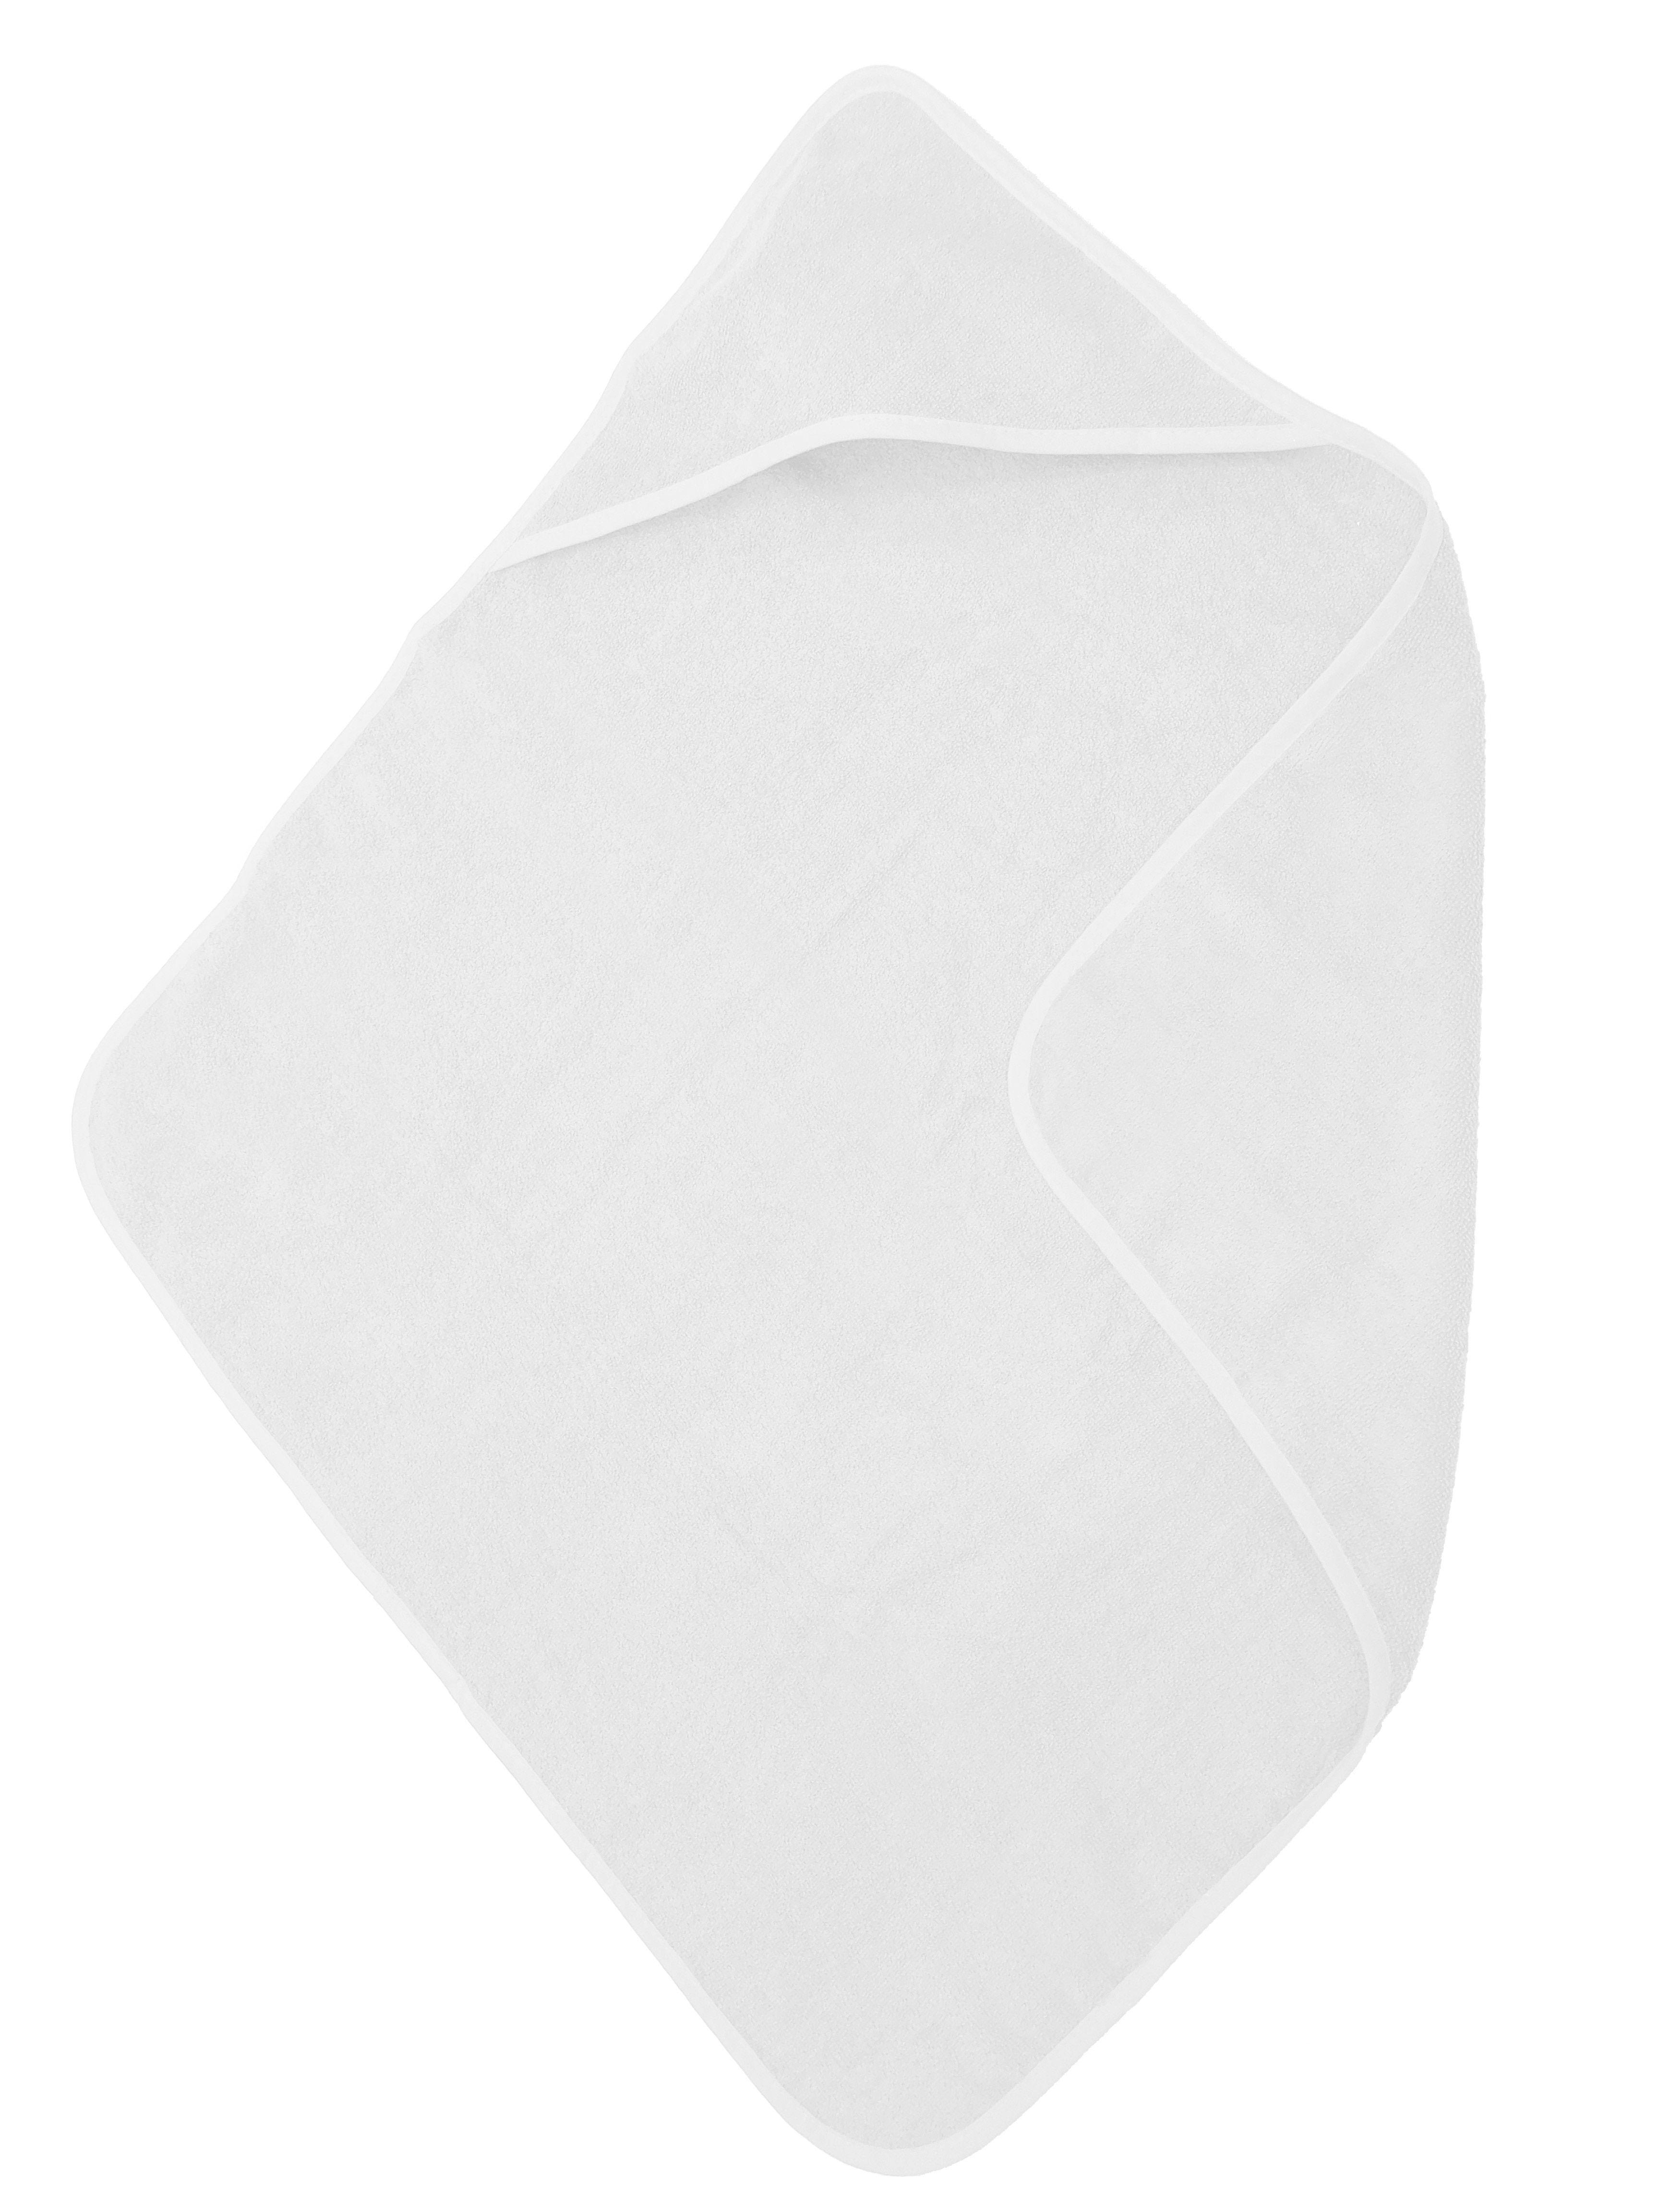 The One Baby Handdoek 75x75 cm 450gram White